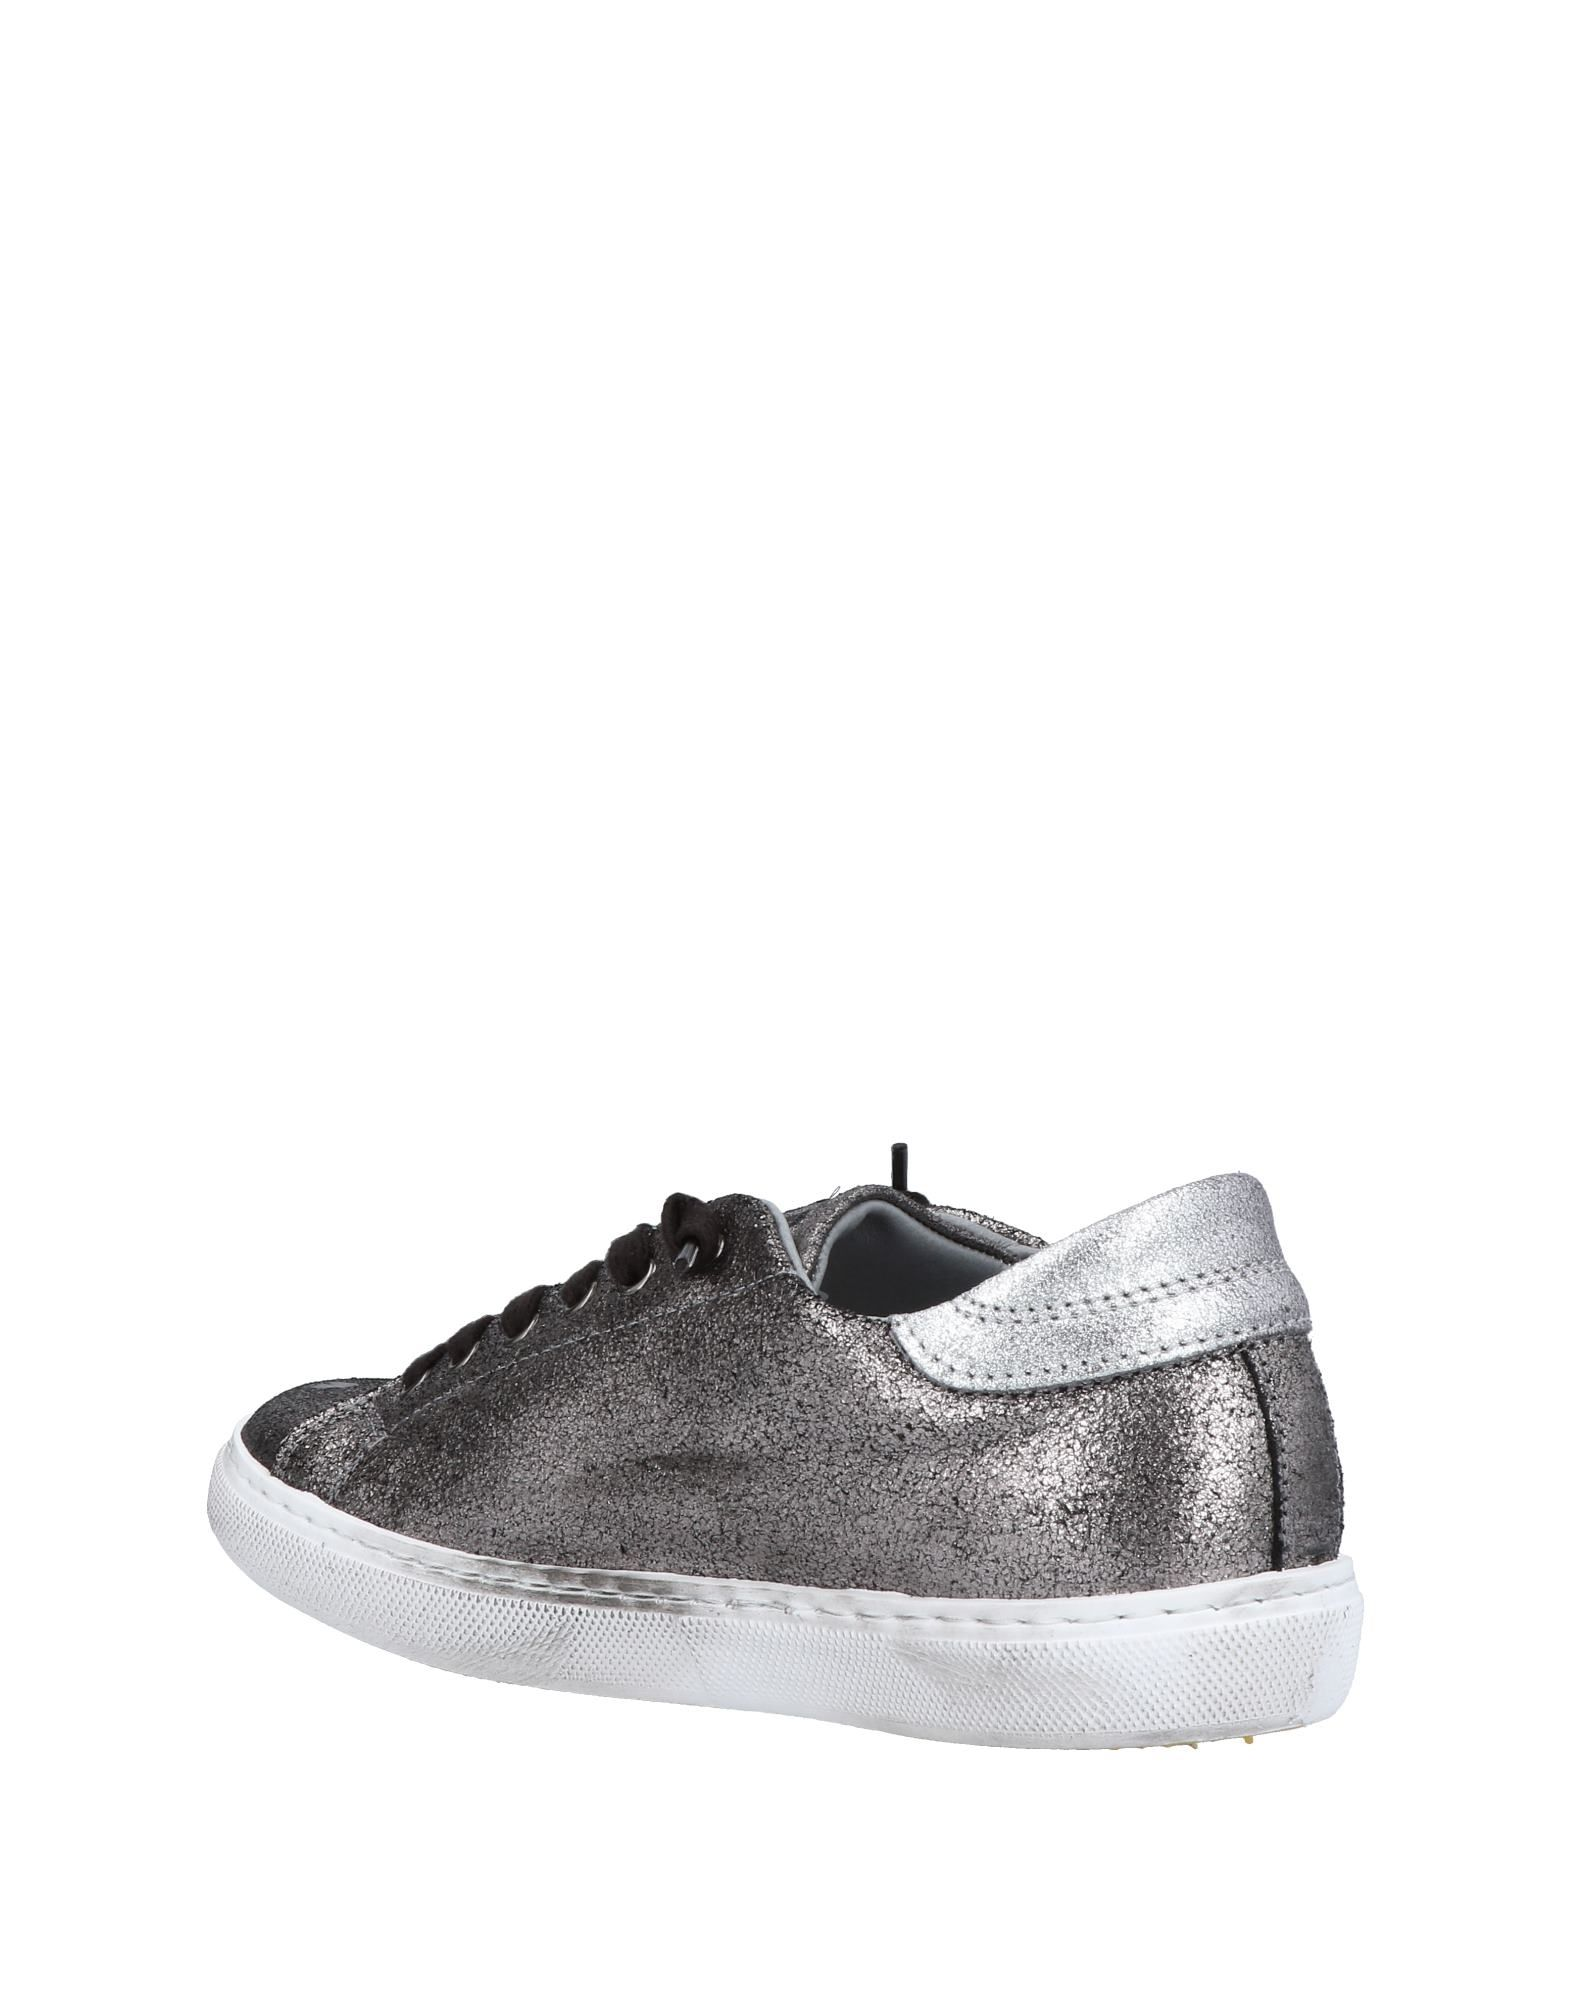 2Star Sneakers Damen  11453590PM   11453590PM 132029